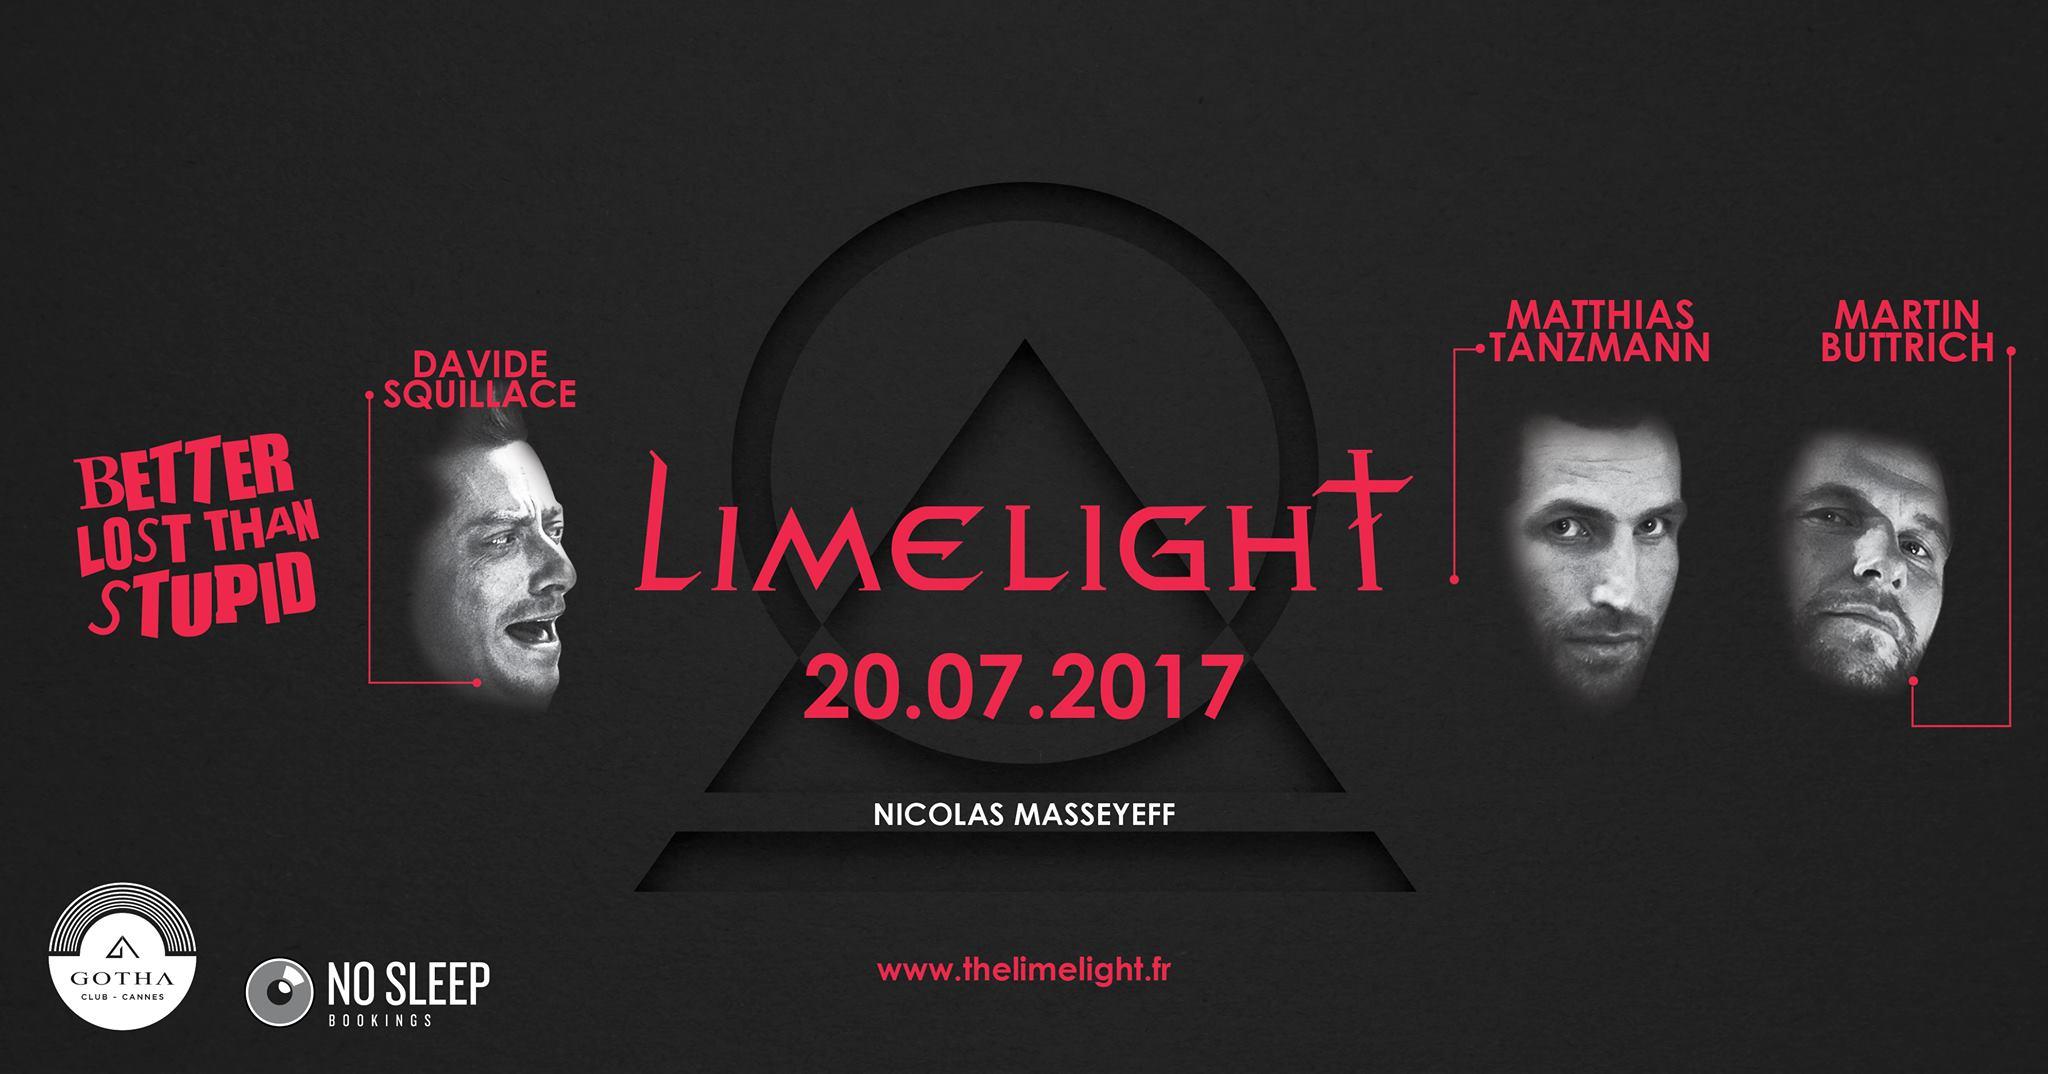 limeligh gotha 2017